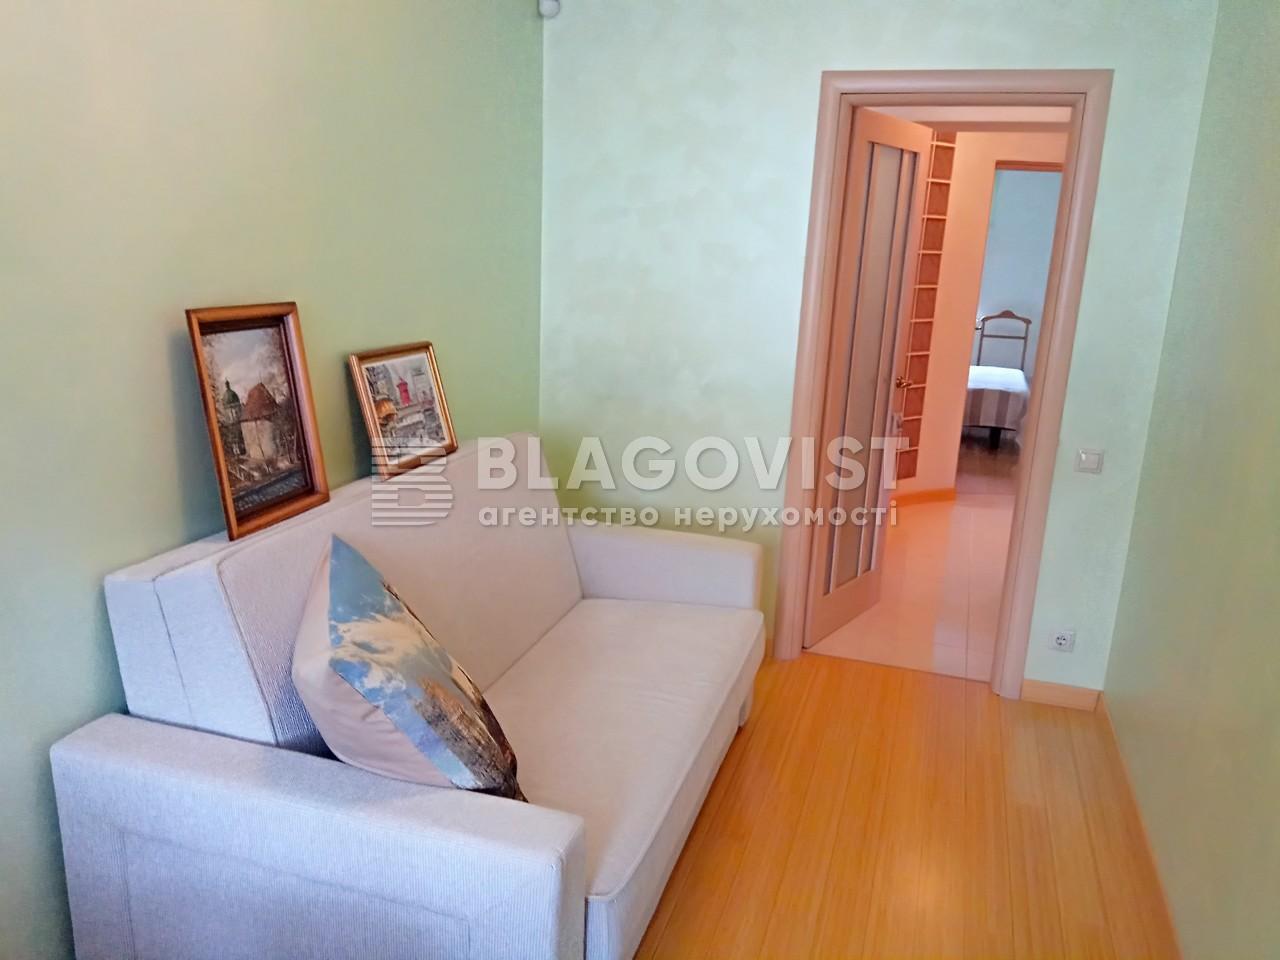 Квартира P-25285, Джона Маккейна (Кудри Ивана), 35б, Киев - Фото 16